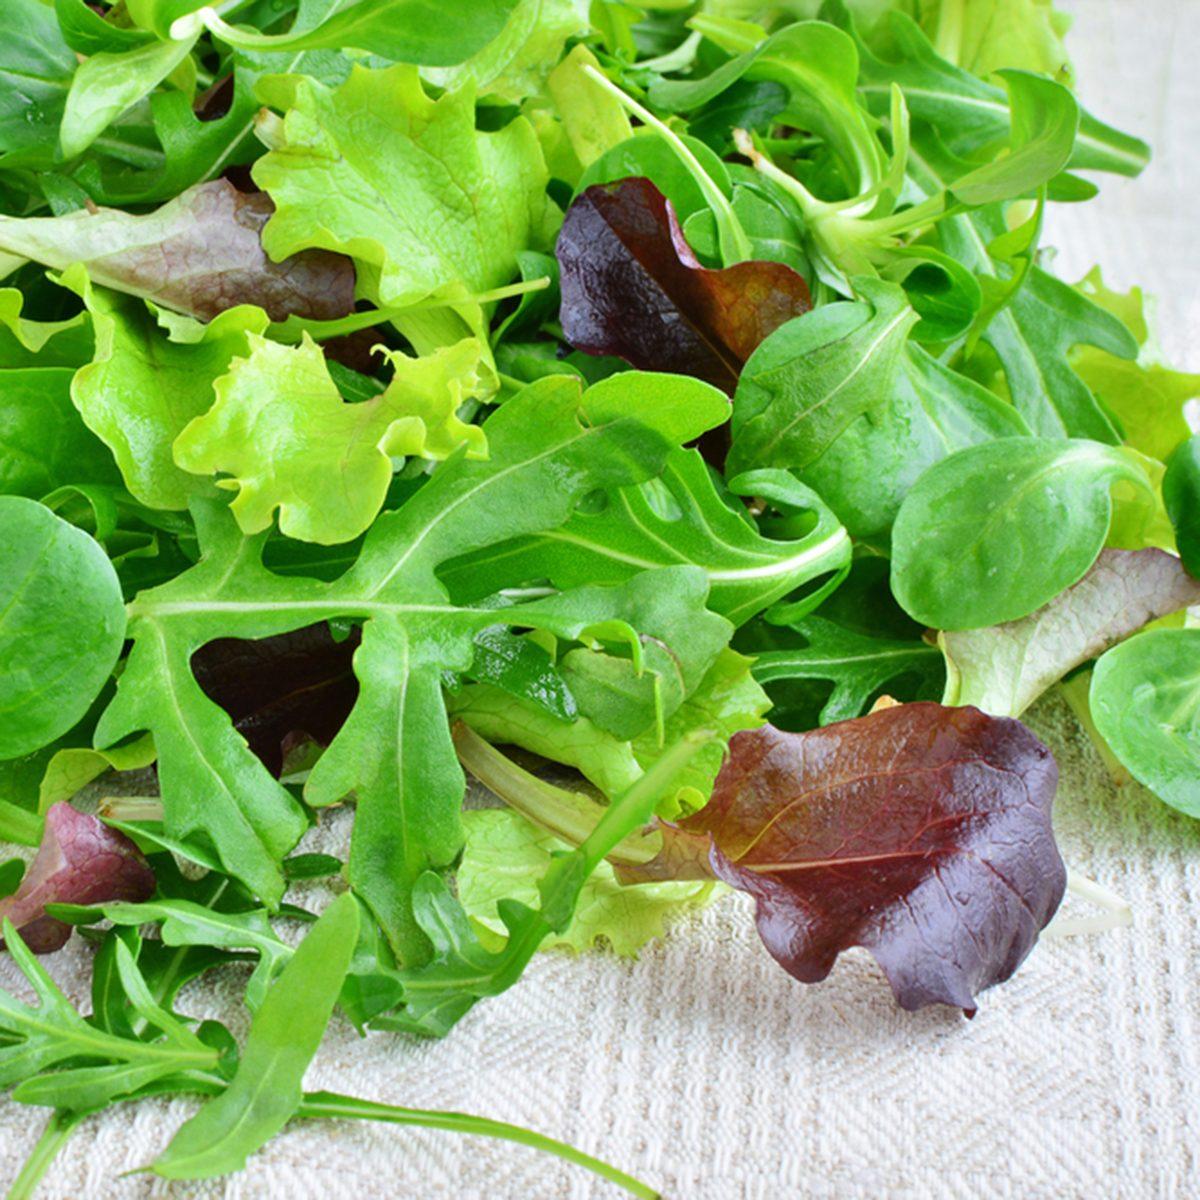 Fresh mixed greens leaf vegetables of arugula, mesclun, mache over kitchen towel